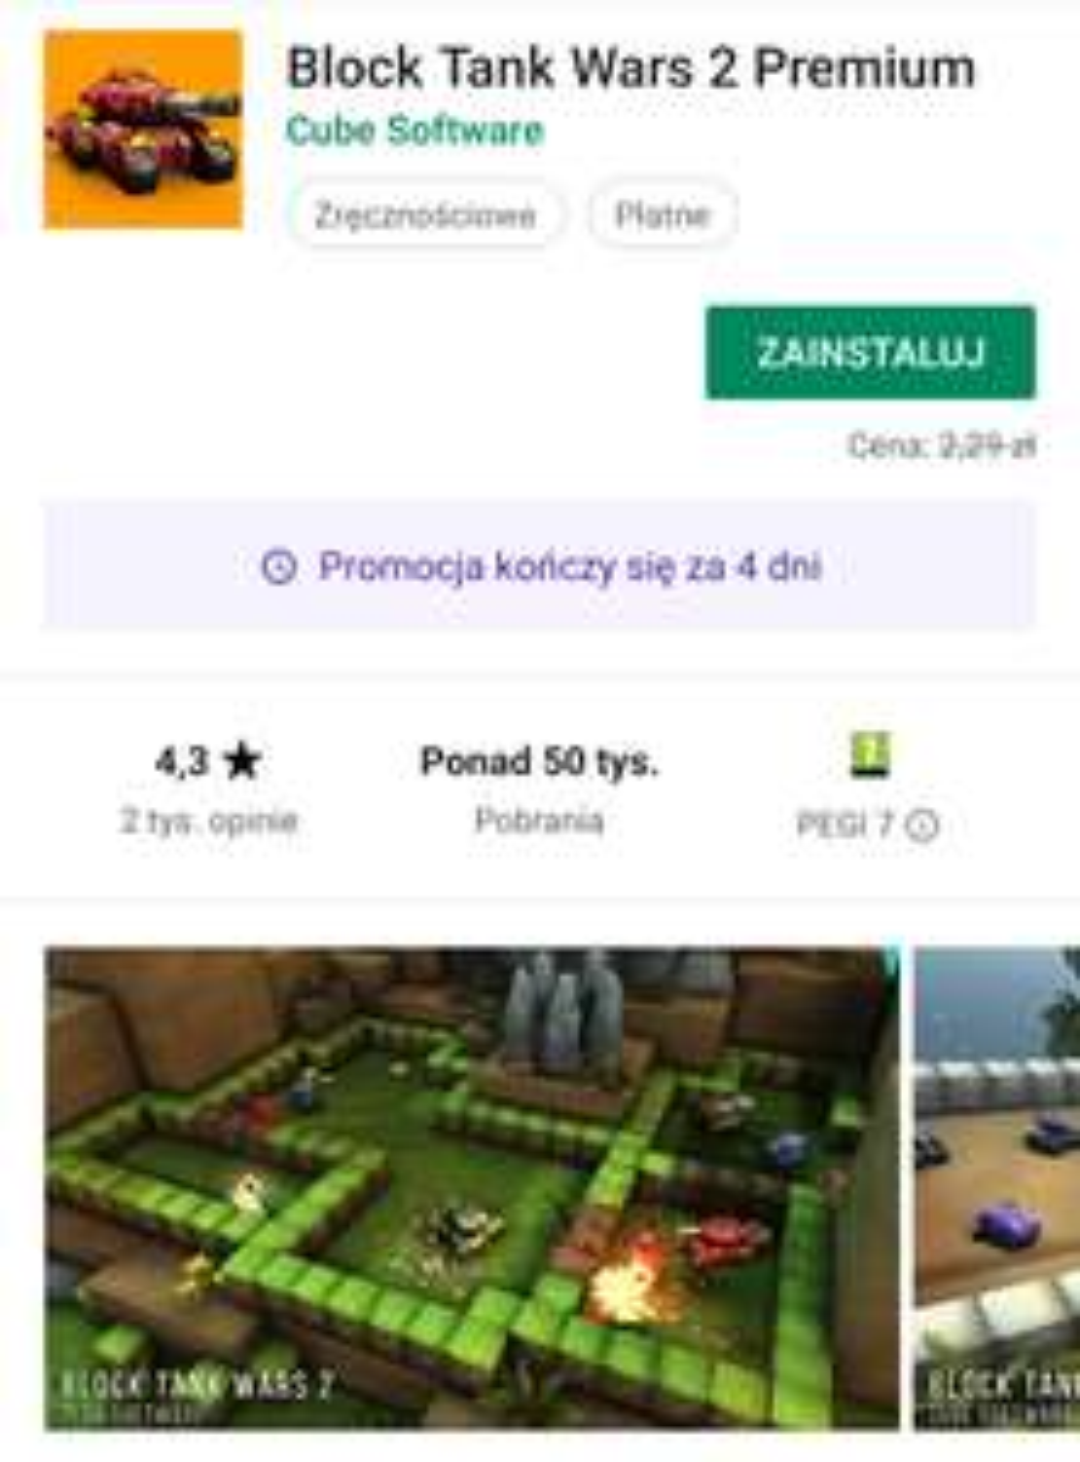 Block Tank Wars 2 Premium - Gra z Google Play za darmo